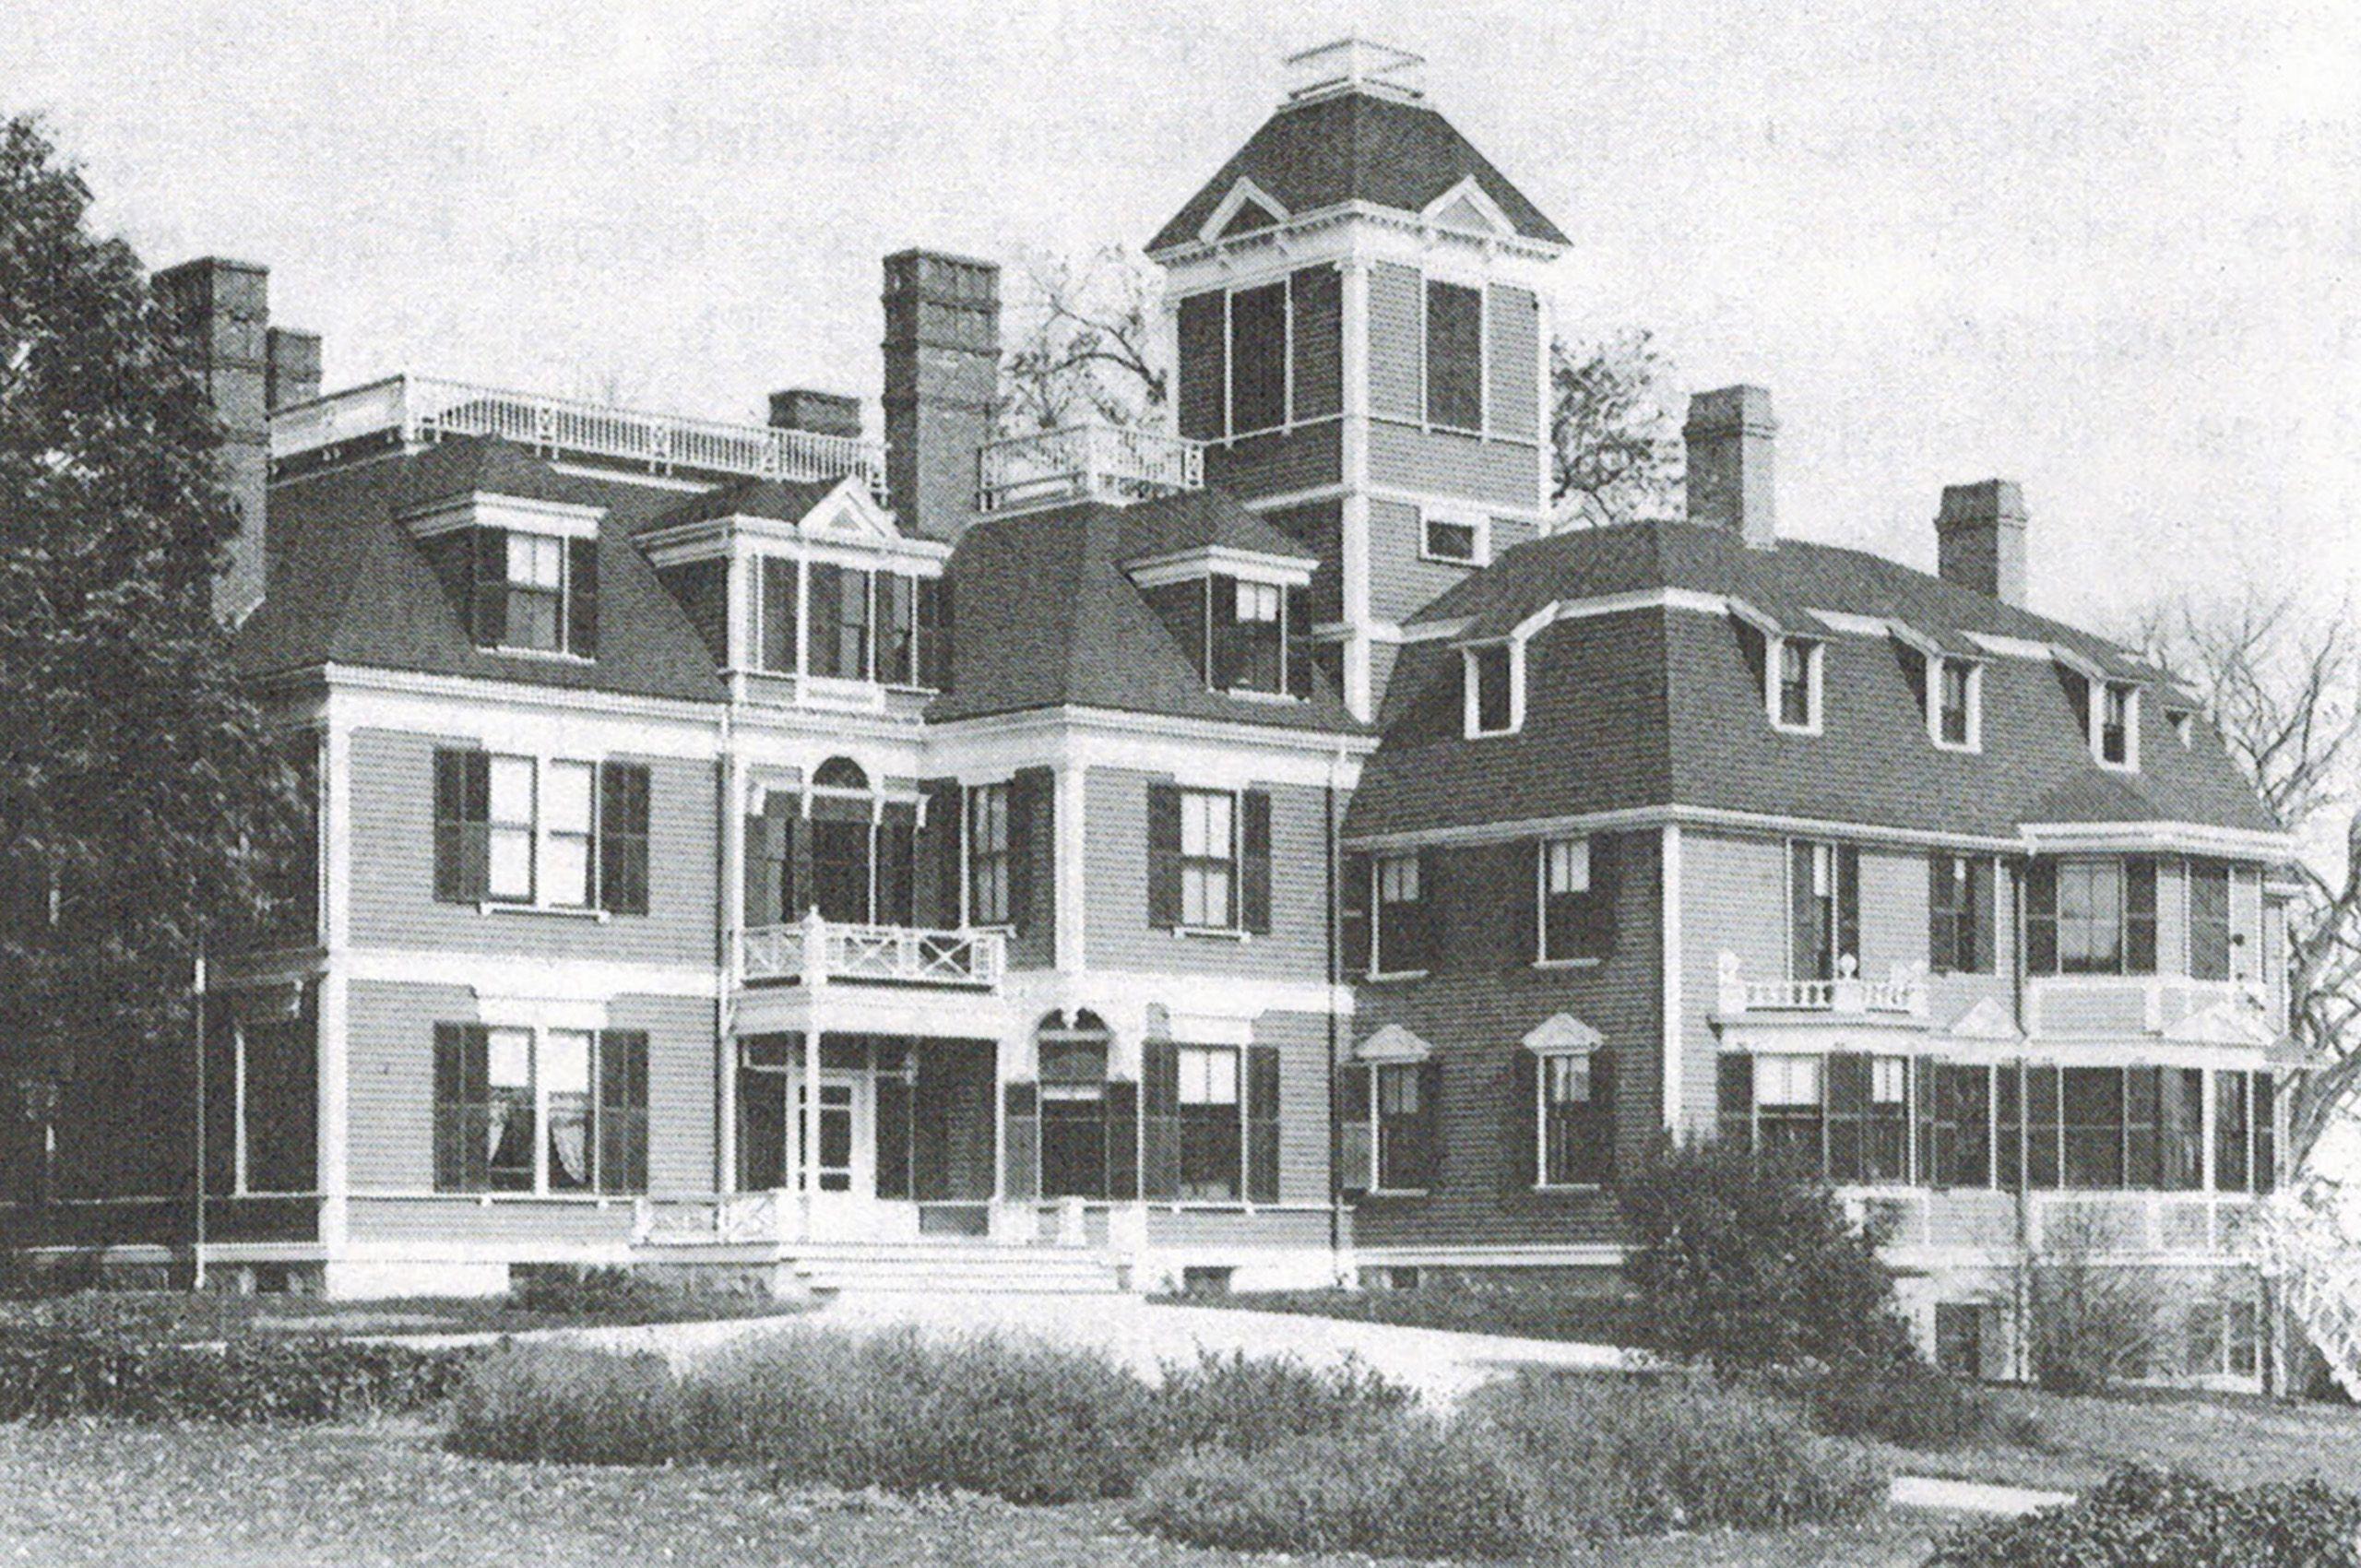 StonyBrook-Apartments-CJPaineResidence.jpg